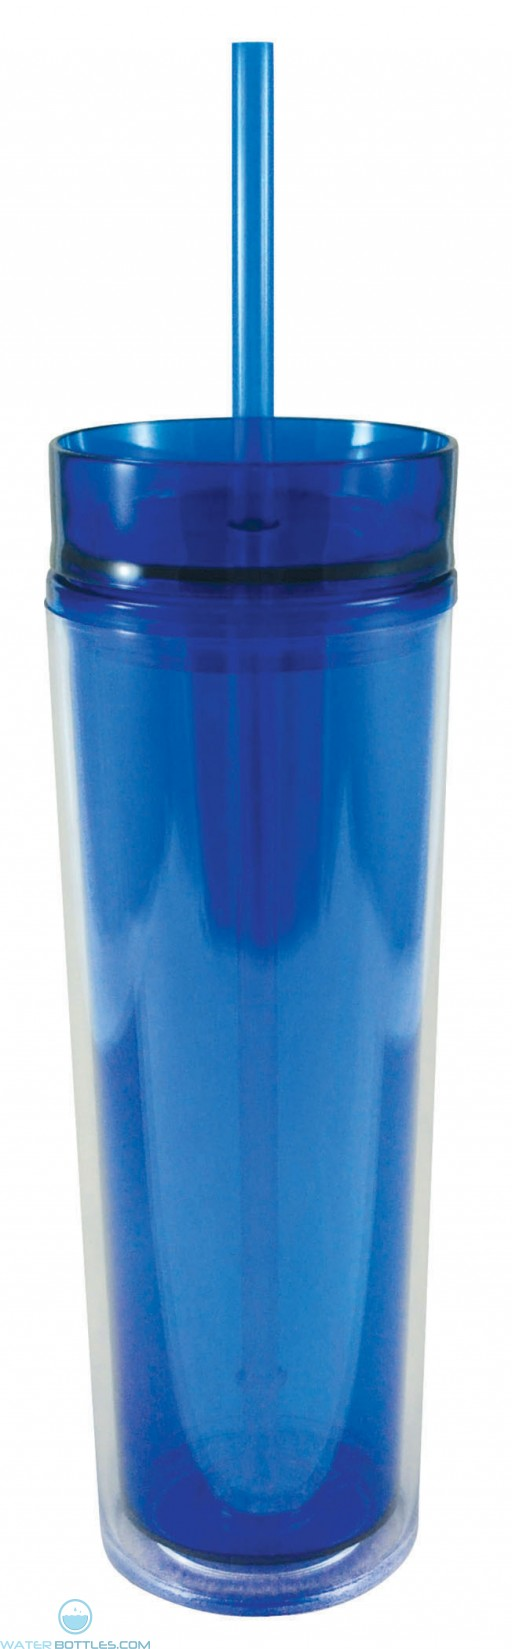 Slender Sip Tumblers   16 oz - Blue